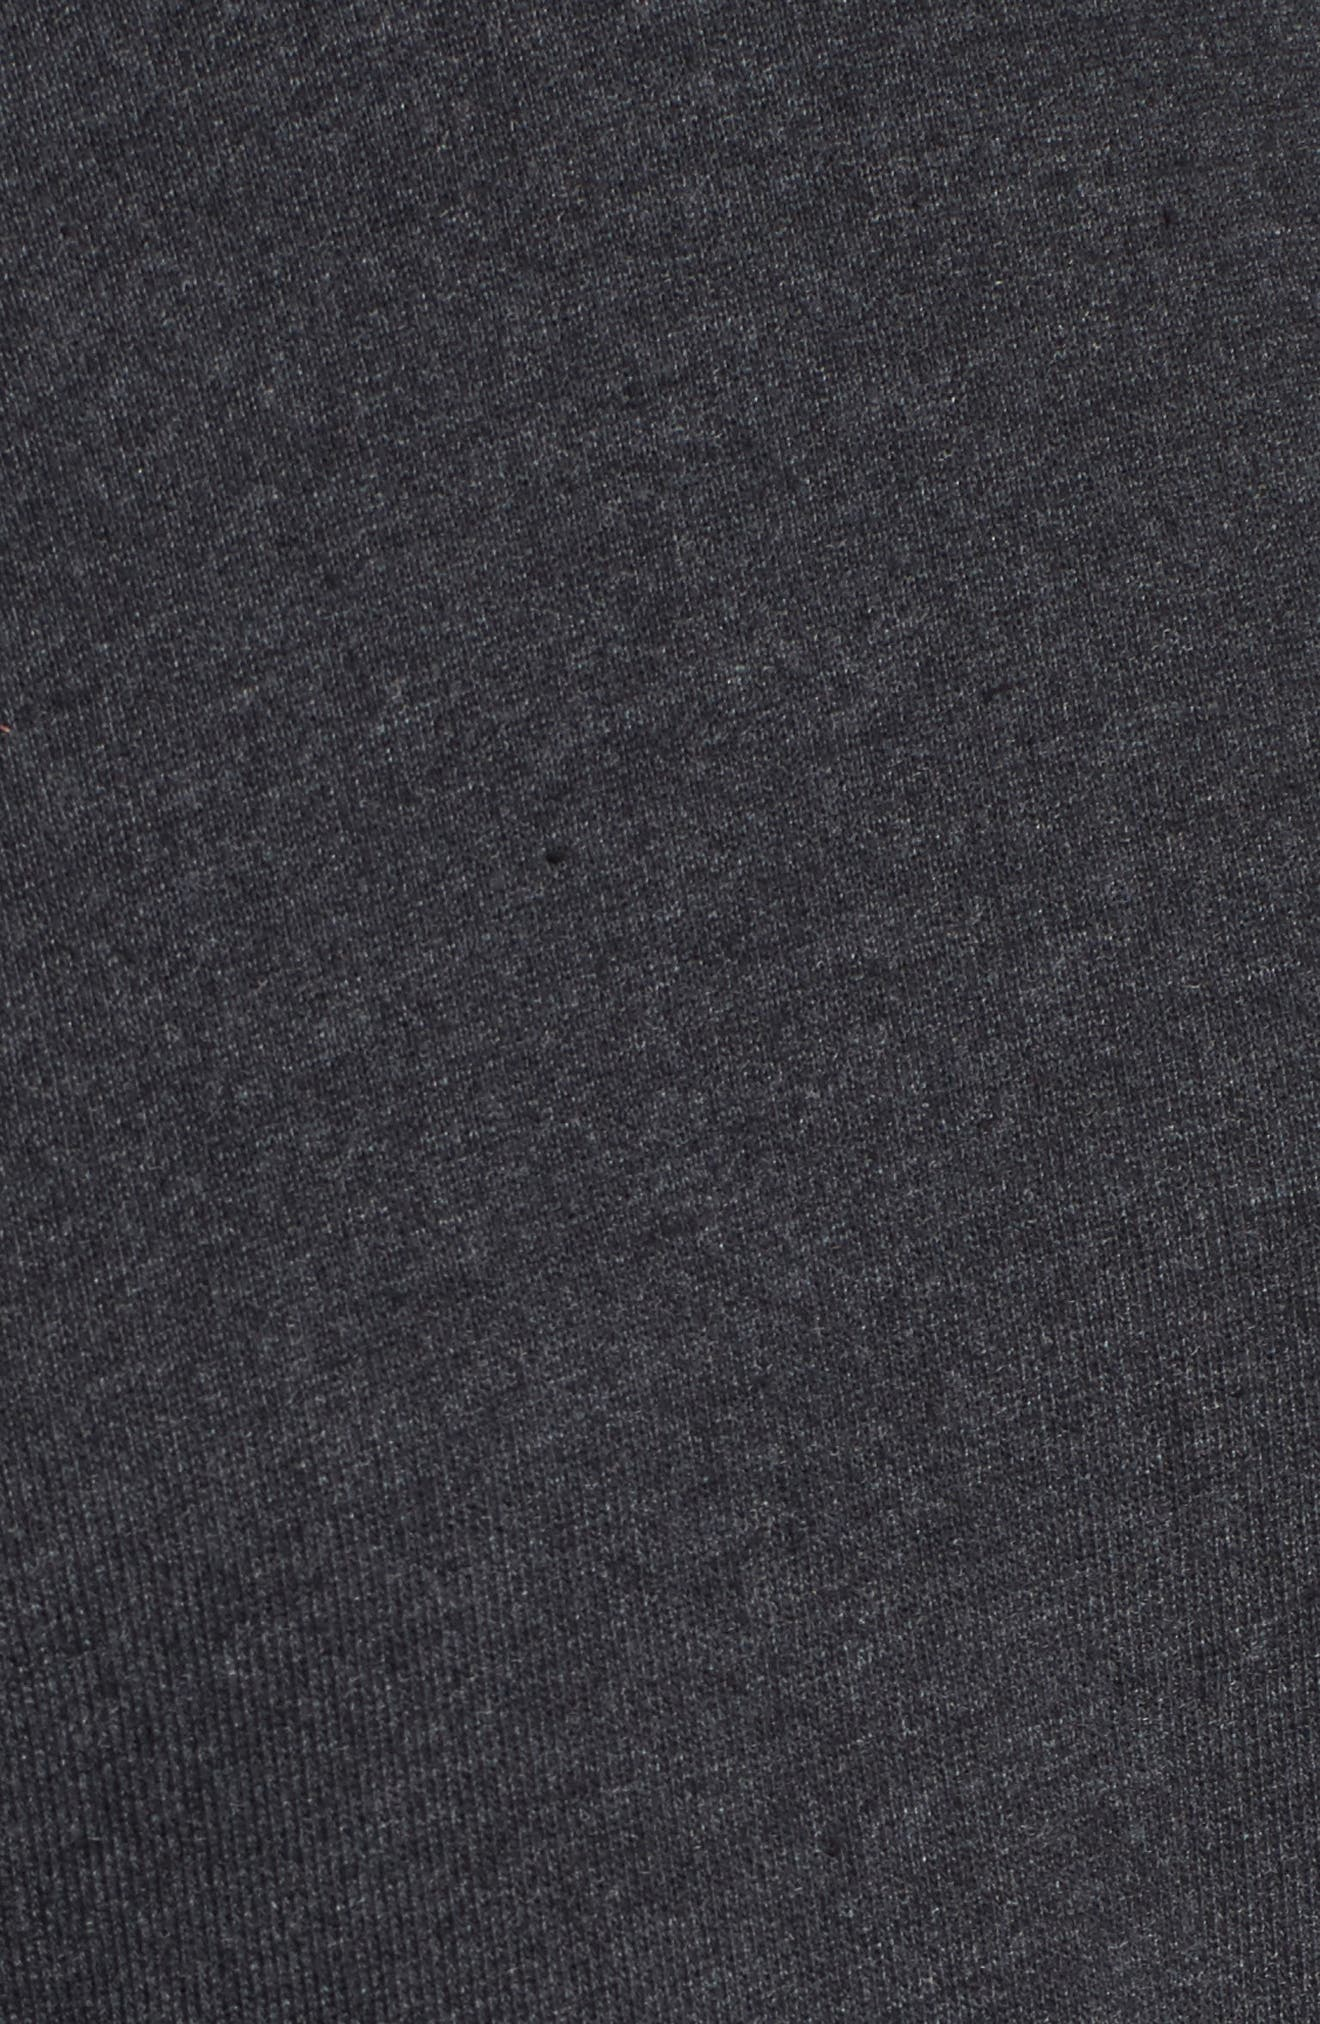 Viera Fleece Peplum Sweatshirt,                             Alternate thumbnail 5, color,                             020